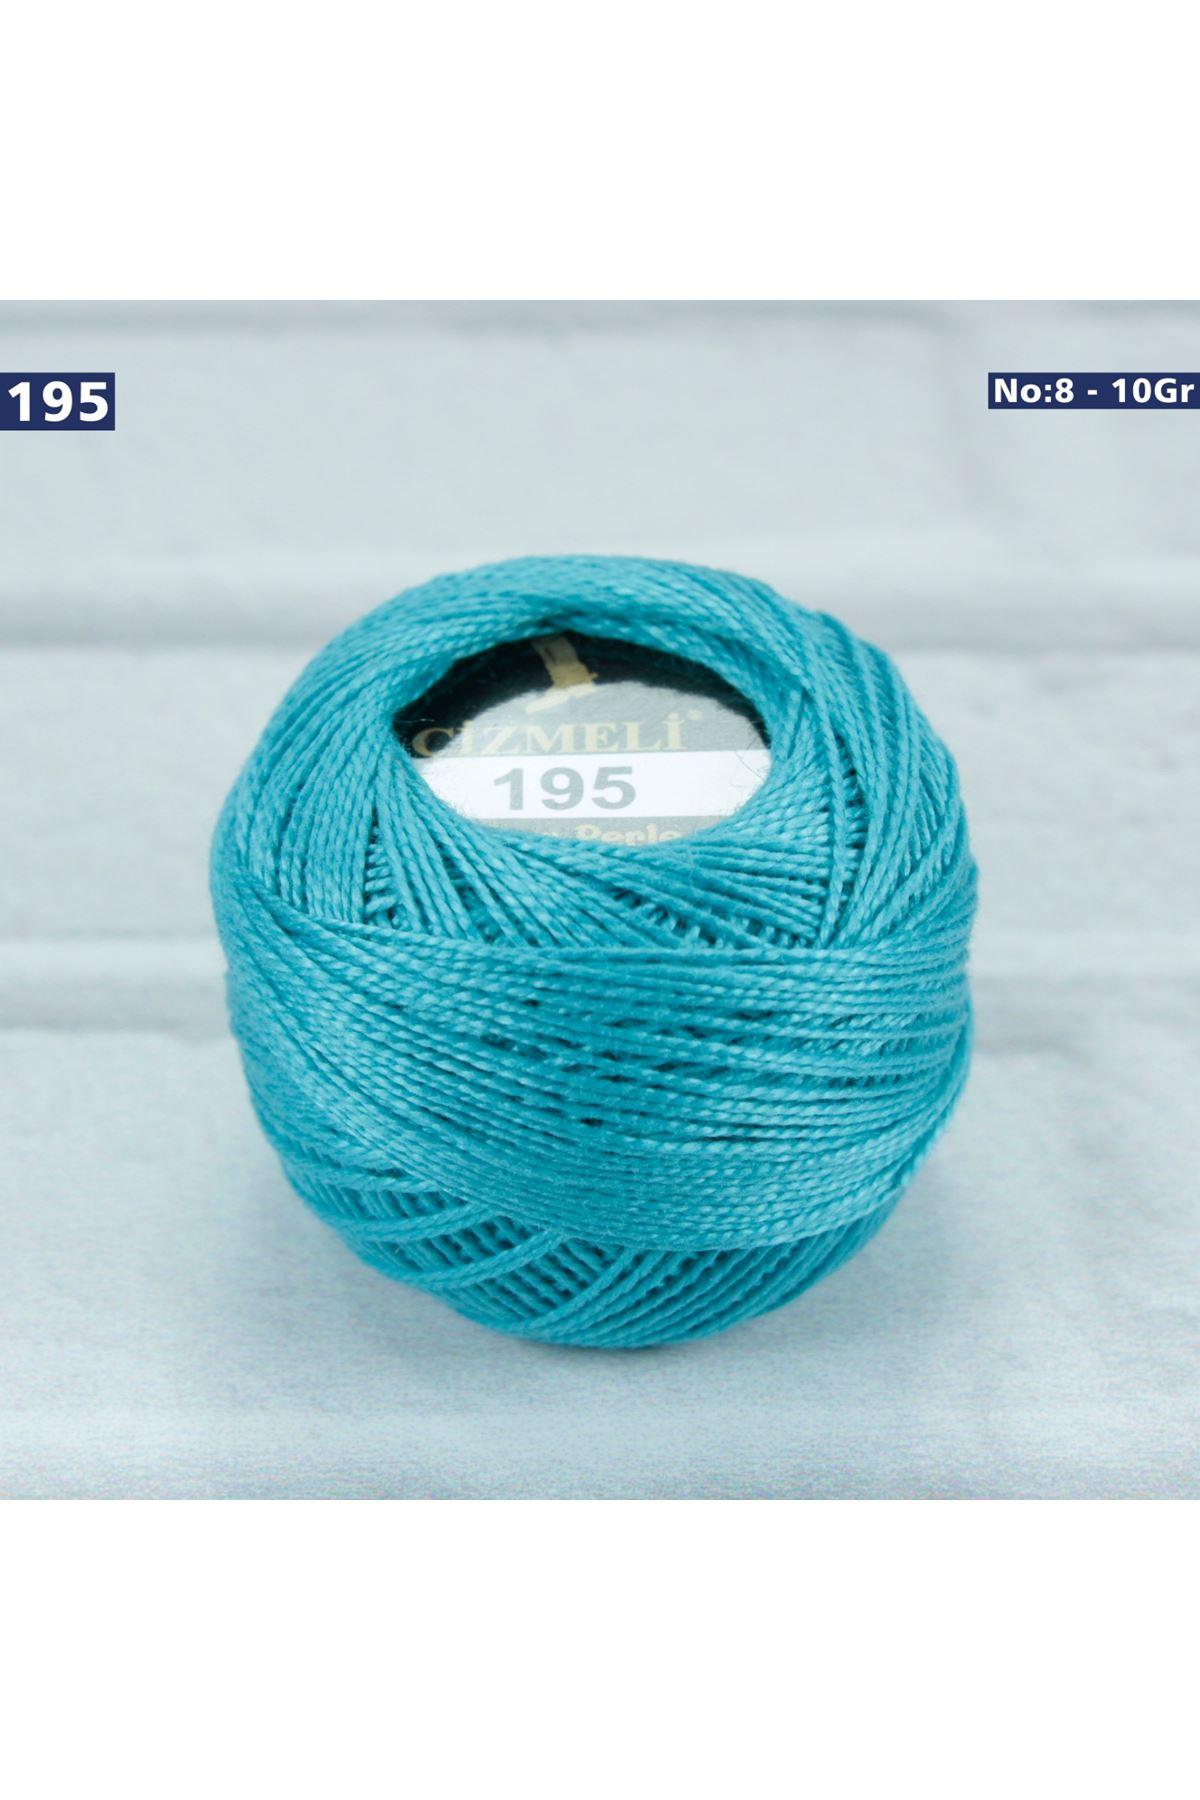 Çizmeli Cotton Perle Nakış İpliği No: 195